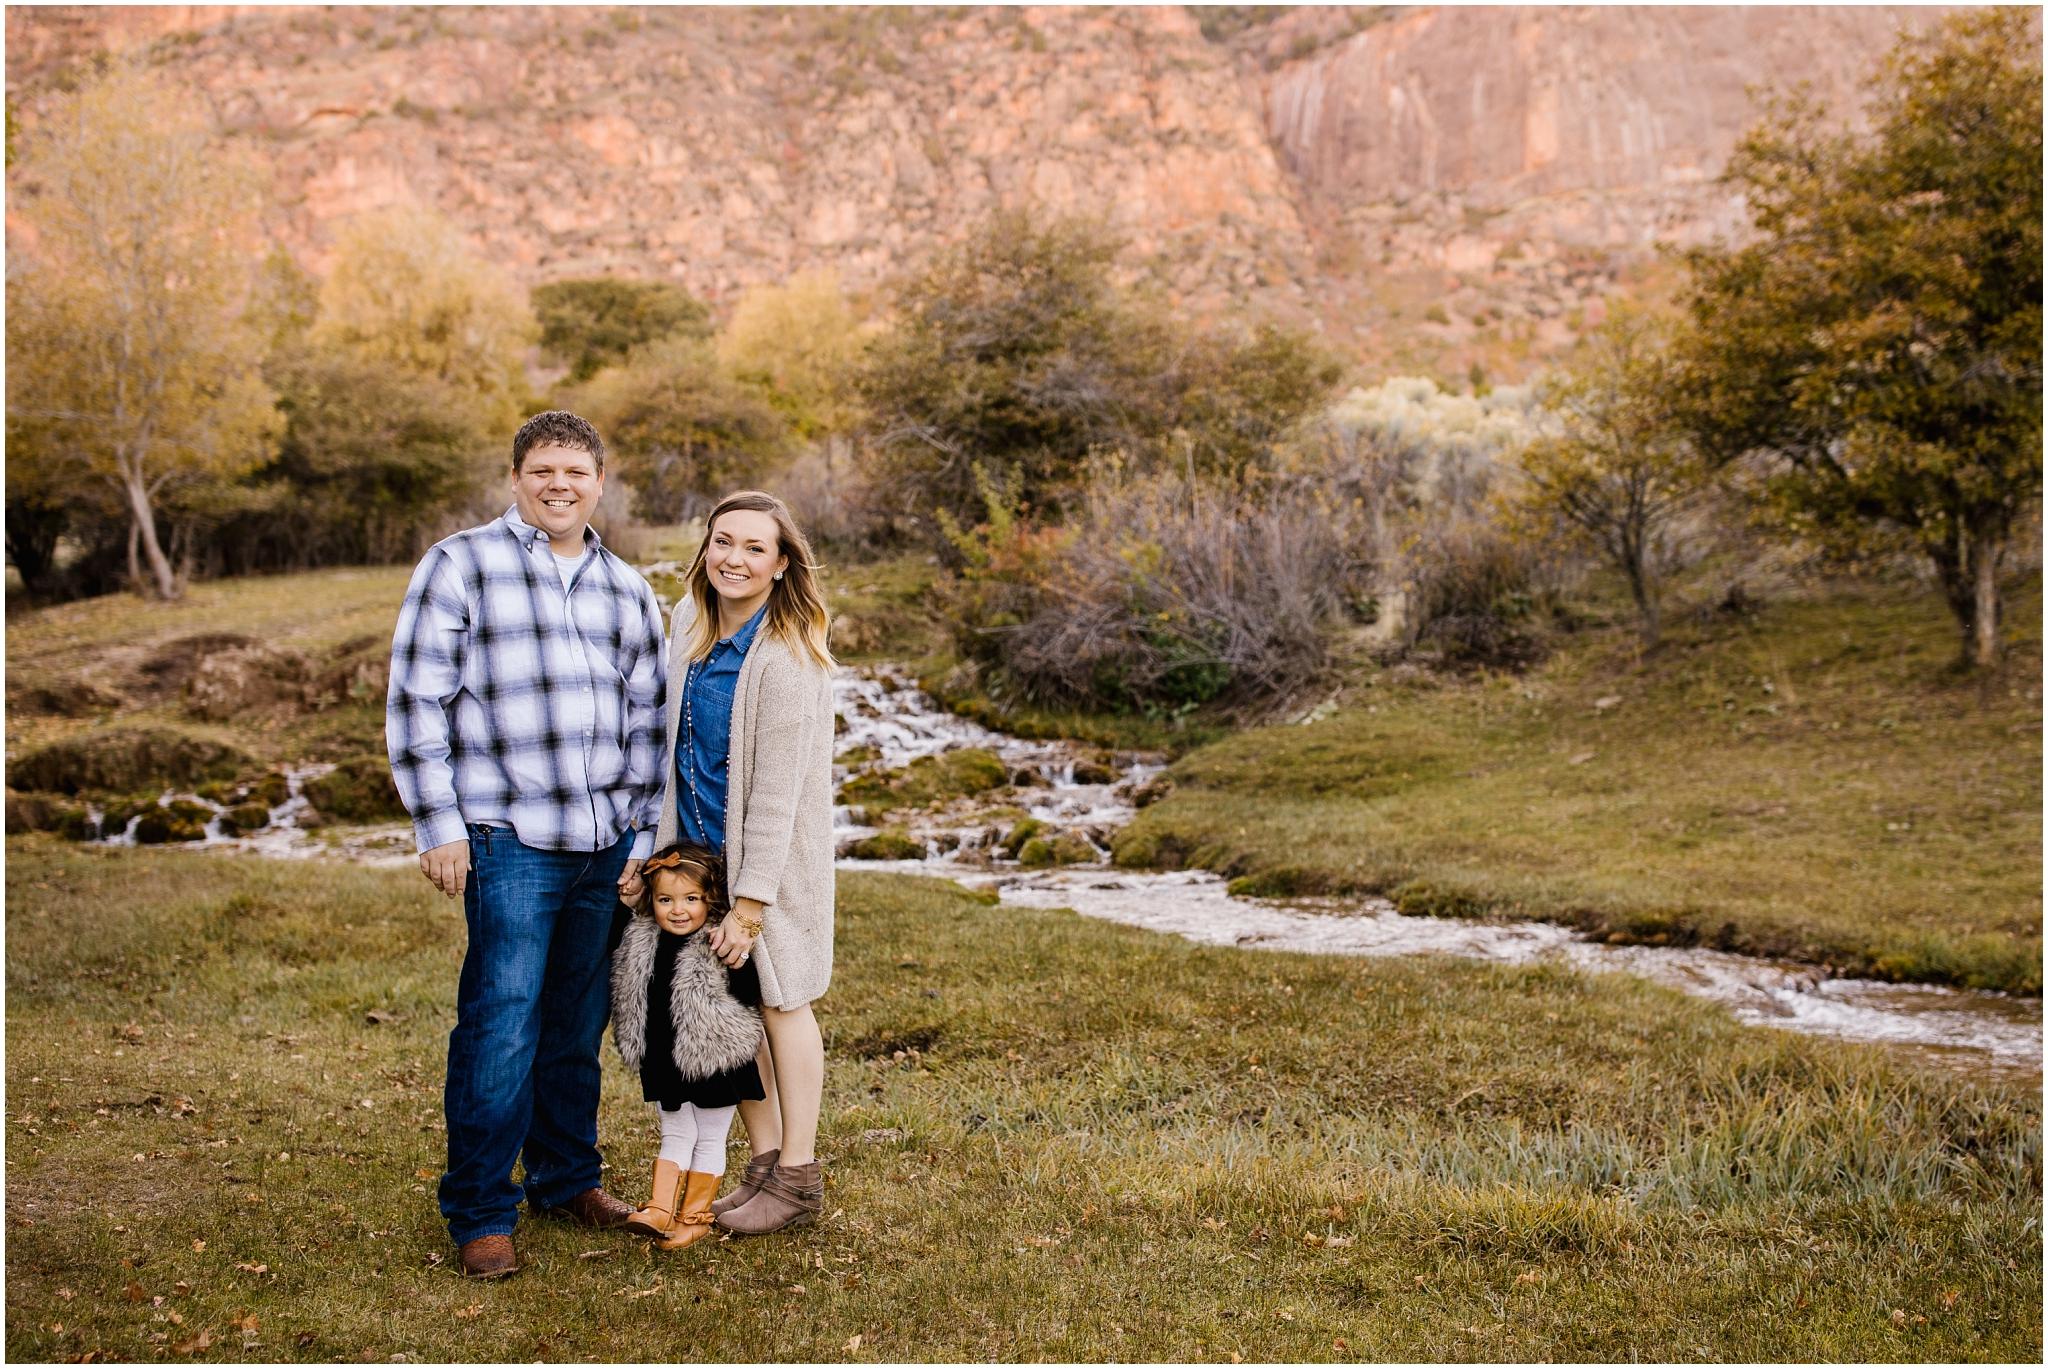 Frandsen-19_Lizzie-B-Imagery-Utah-Family-Photographer-Utah-County-Central-Utah-Park-City-Salt-Lake-City.jpg